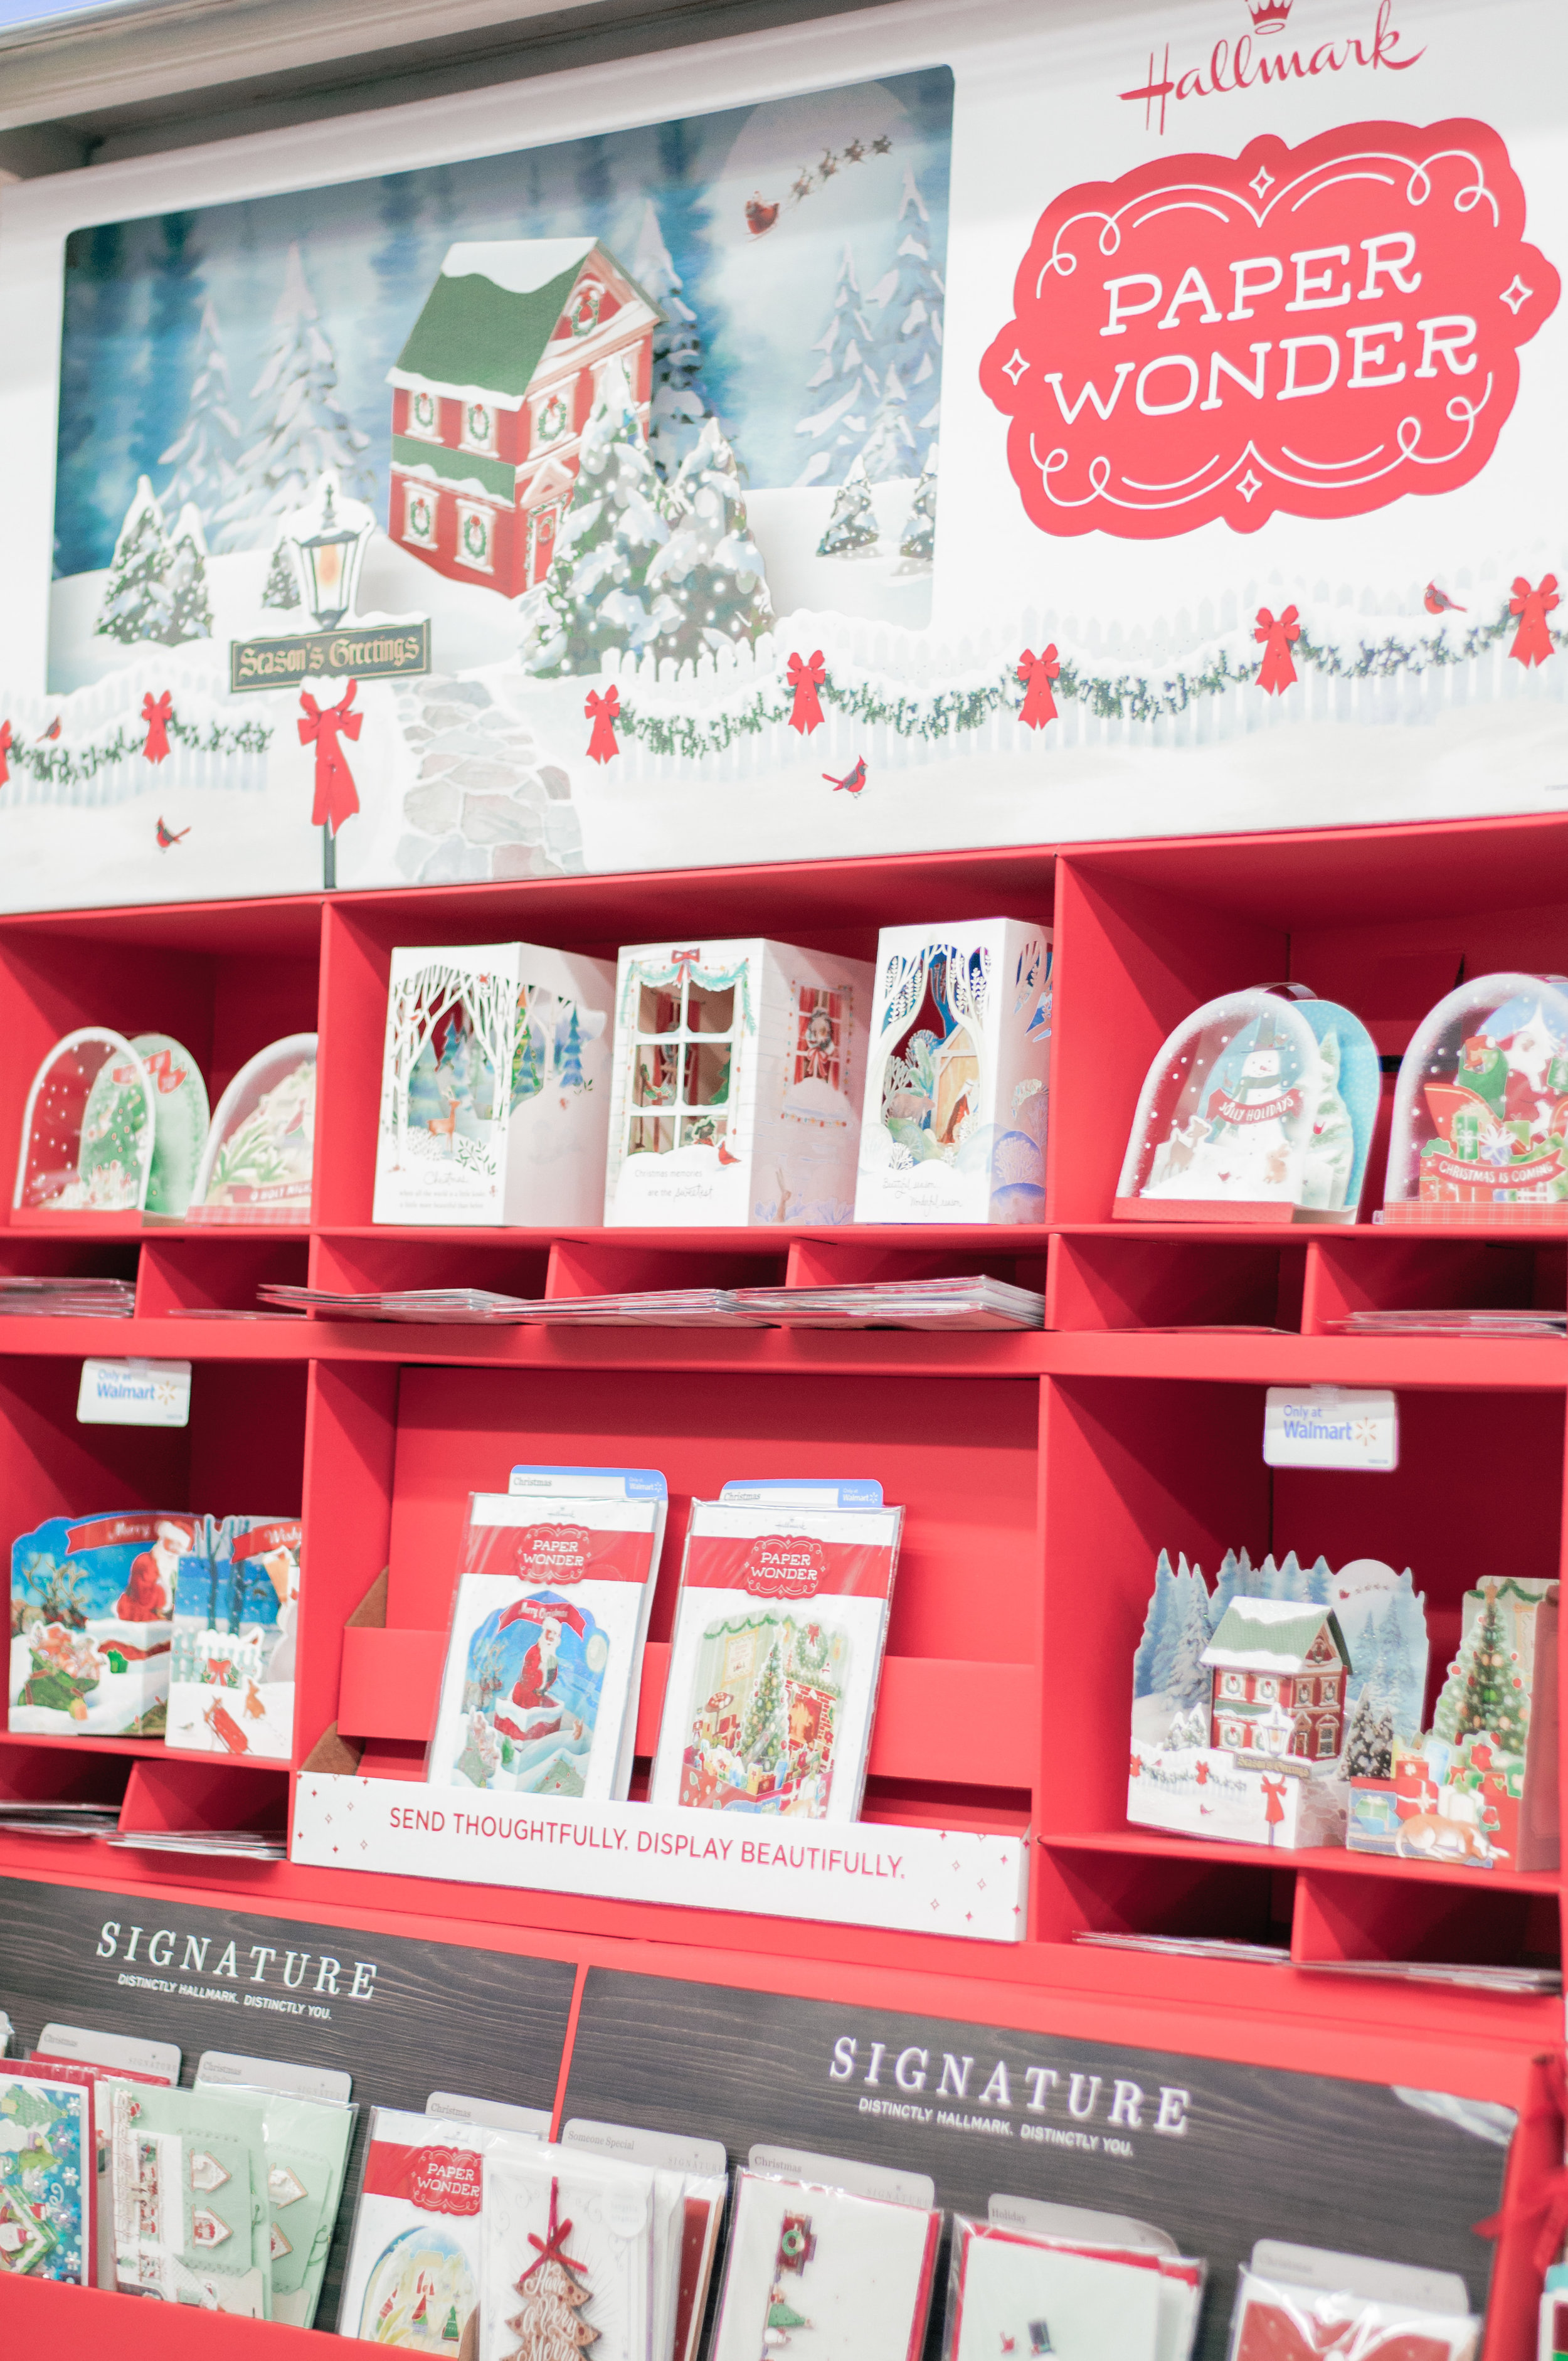 Hallmark Holiday Cards at Walmart